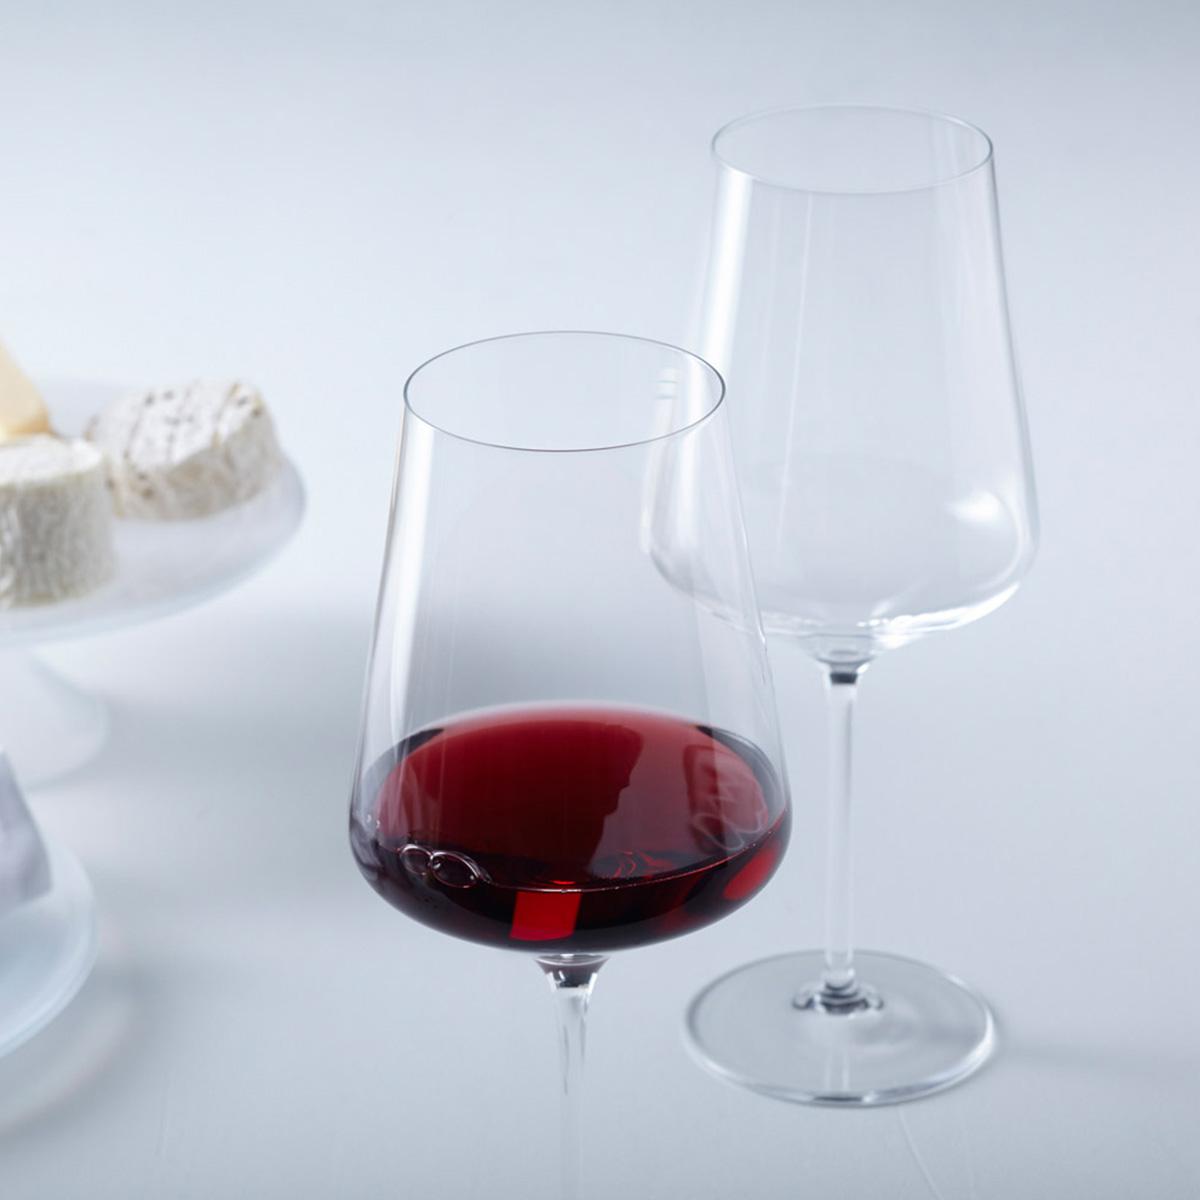 čaša za crveno vino Puccini 69554